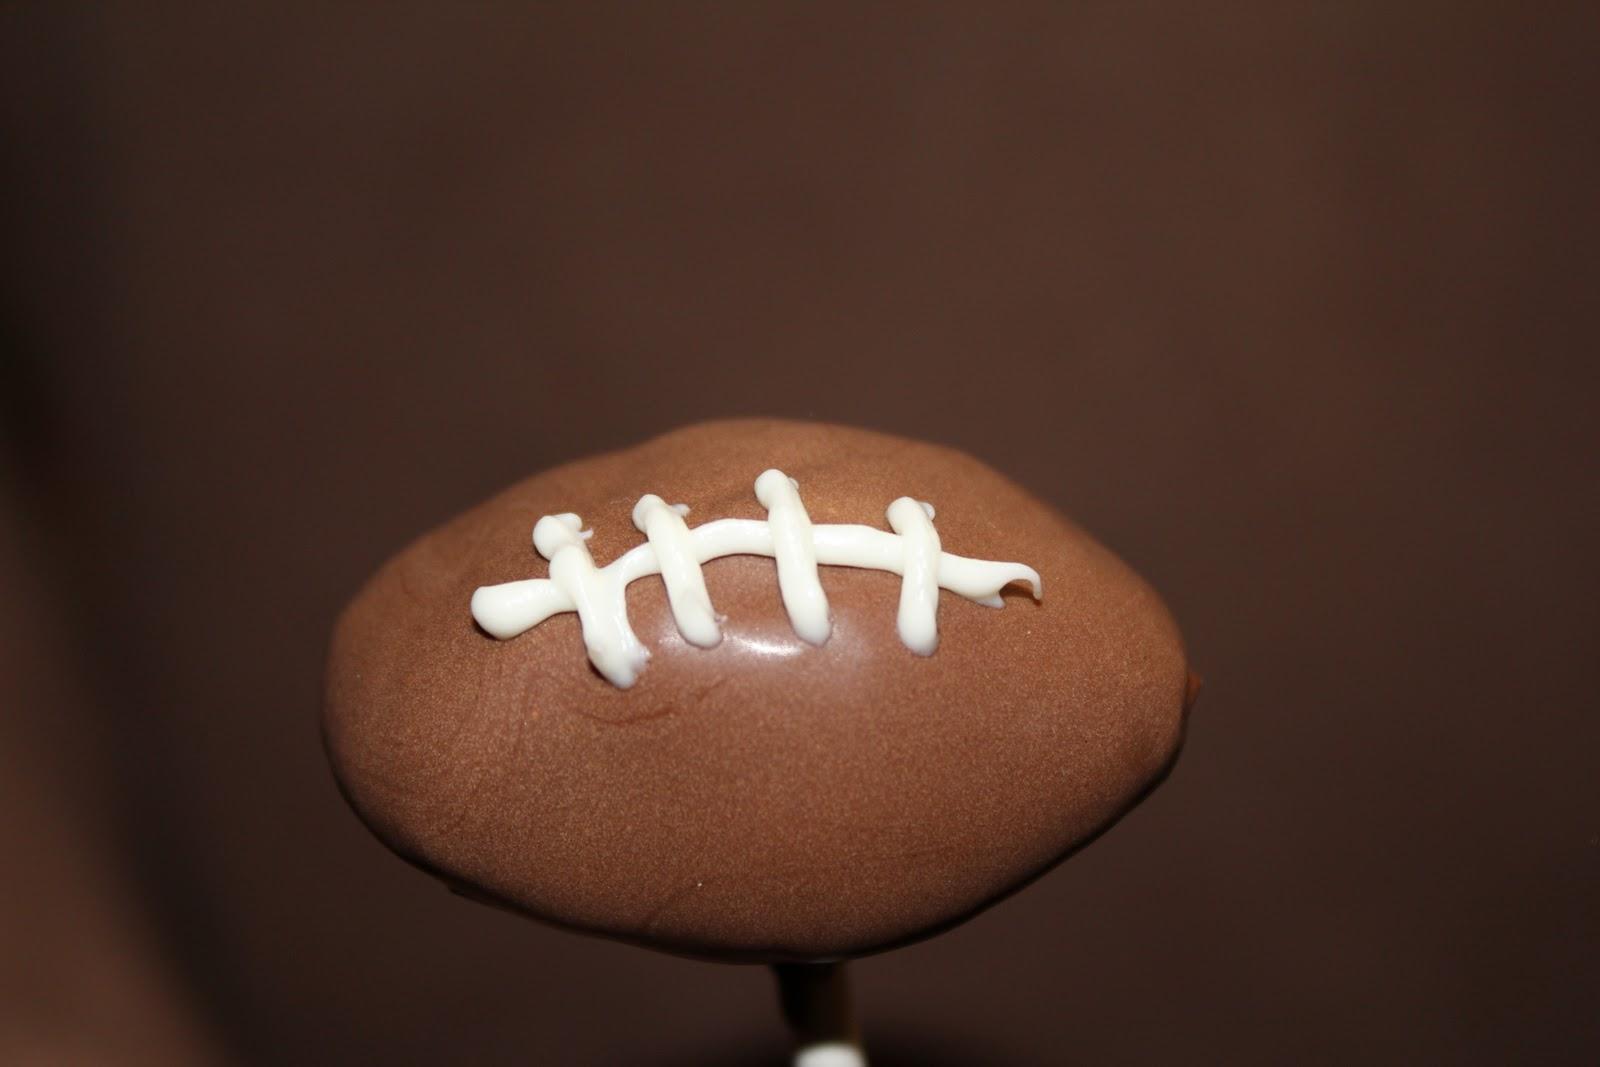 Football Shaped Cake Recipe